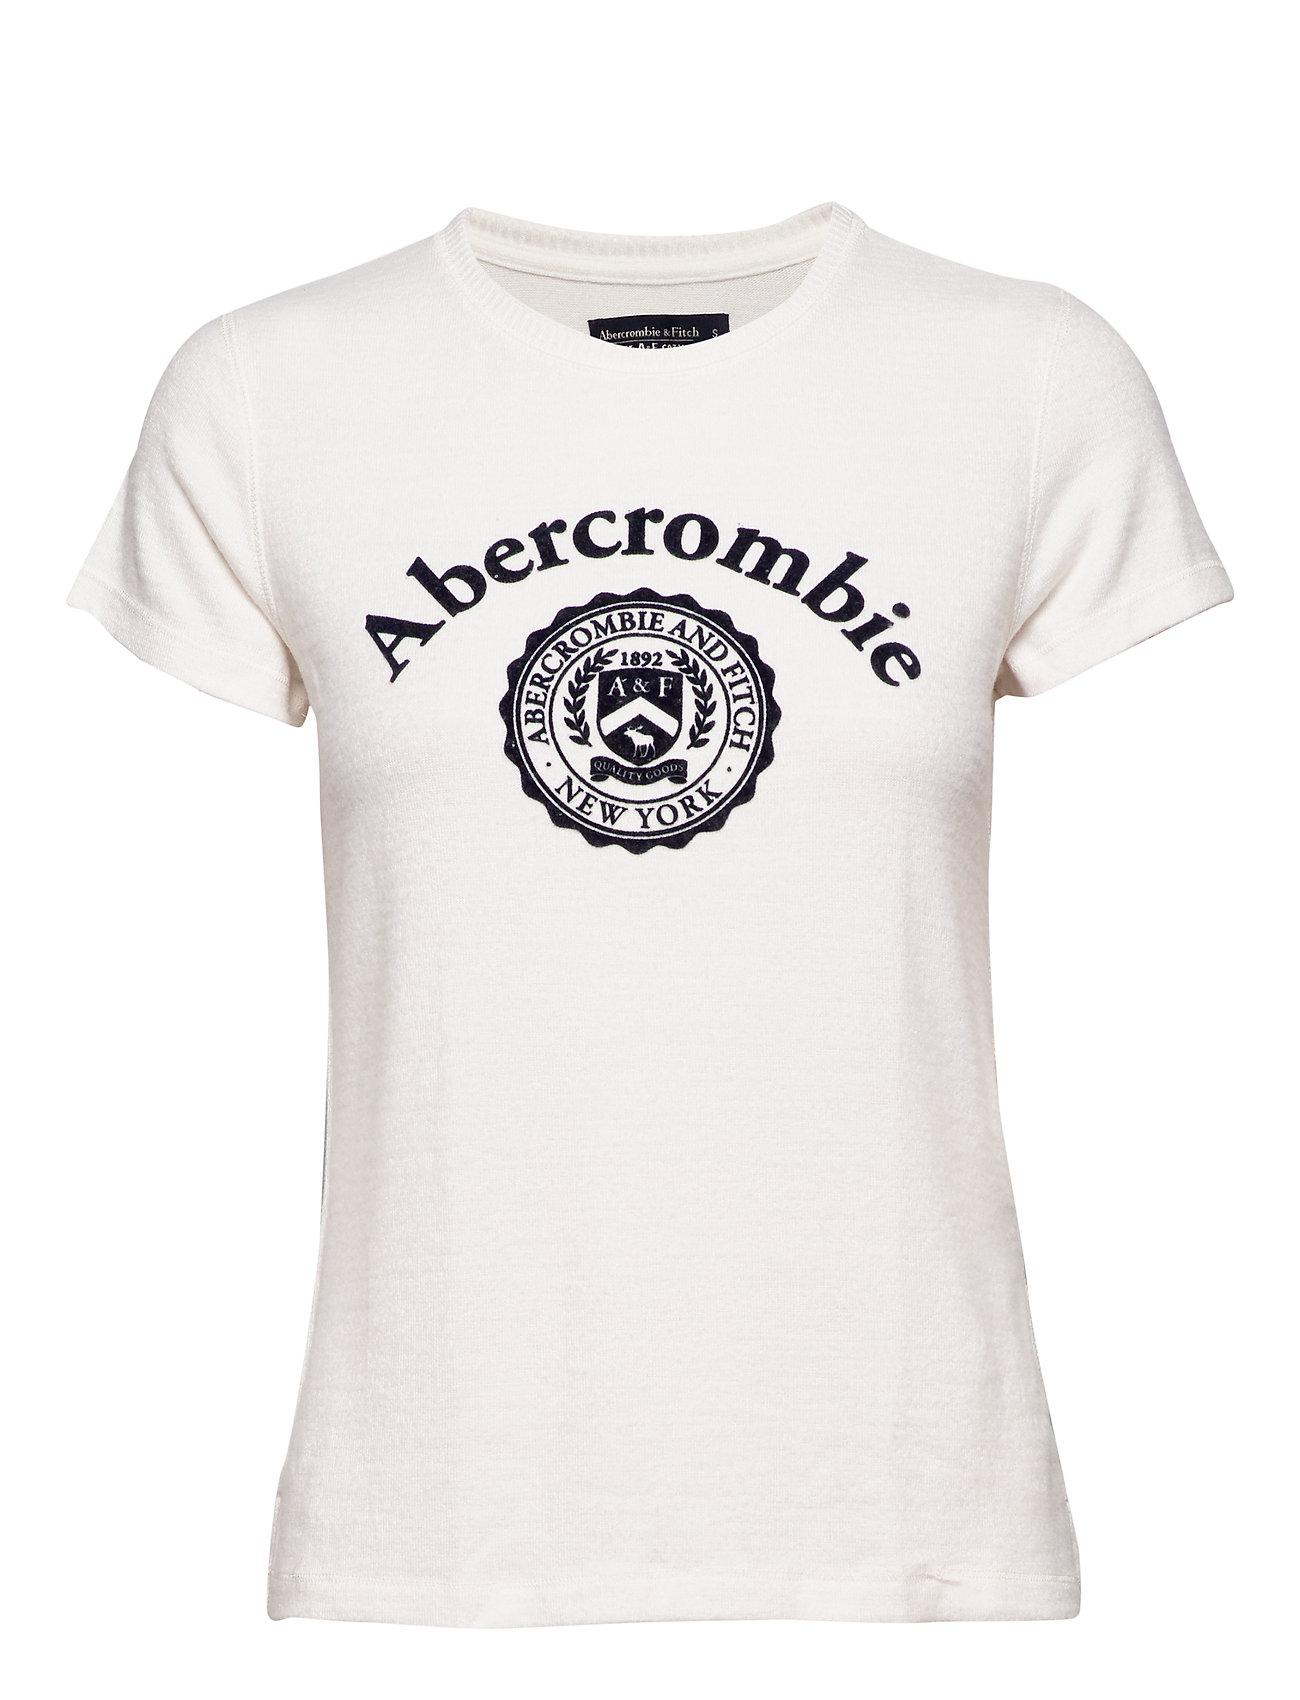 Abercrombie & Fitch Cozy Logo Tee - WHITE